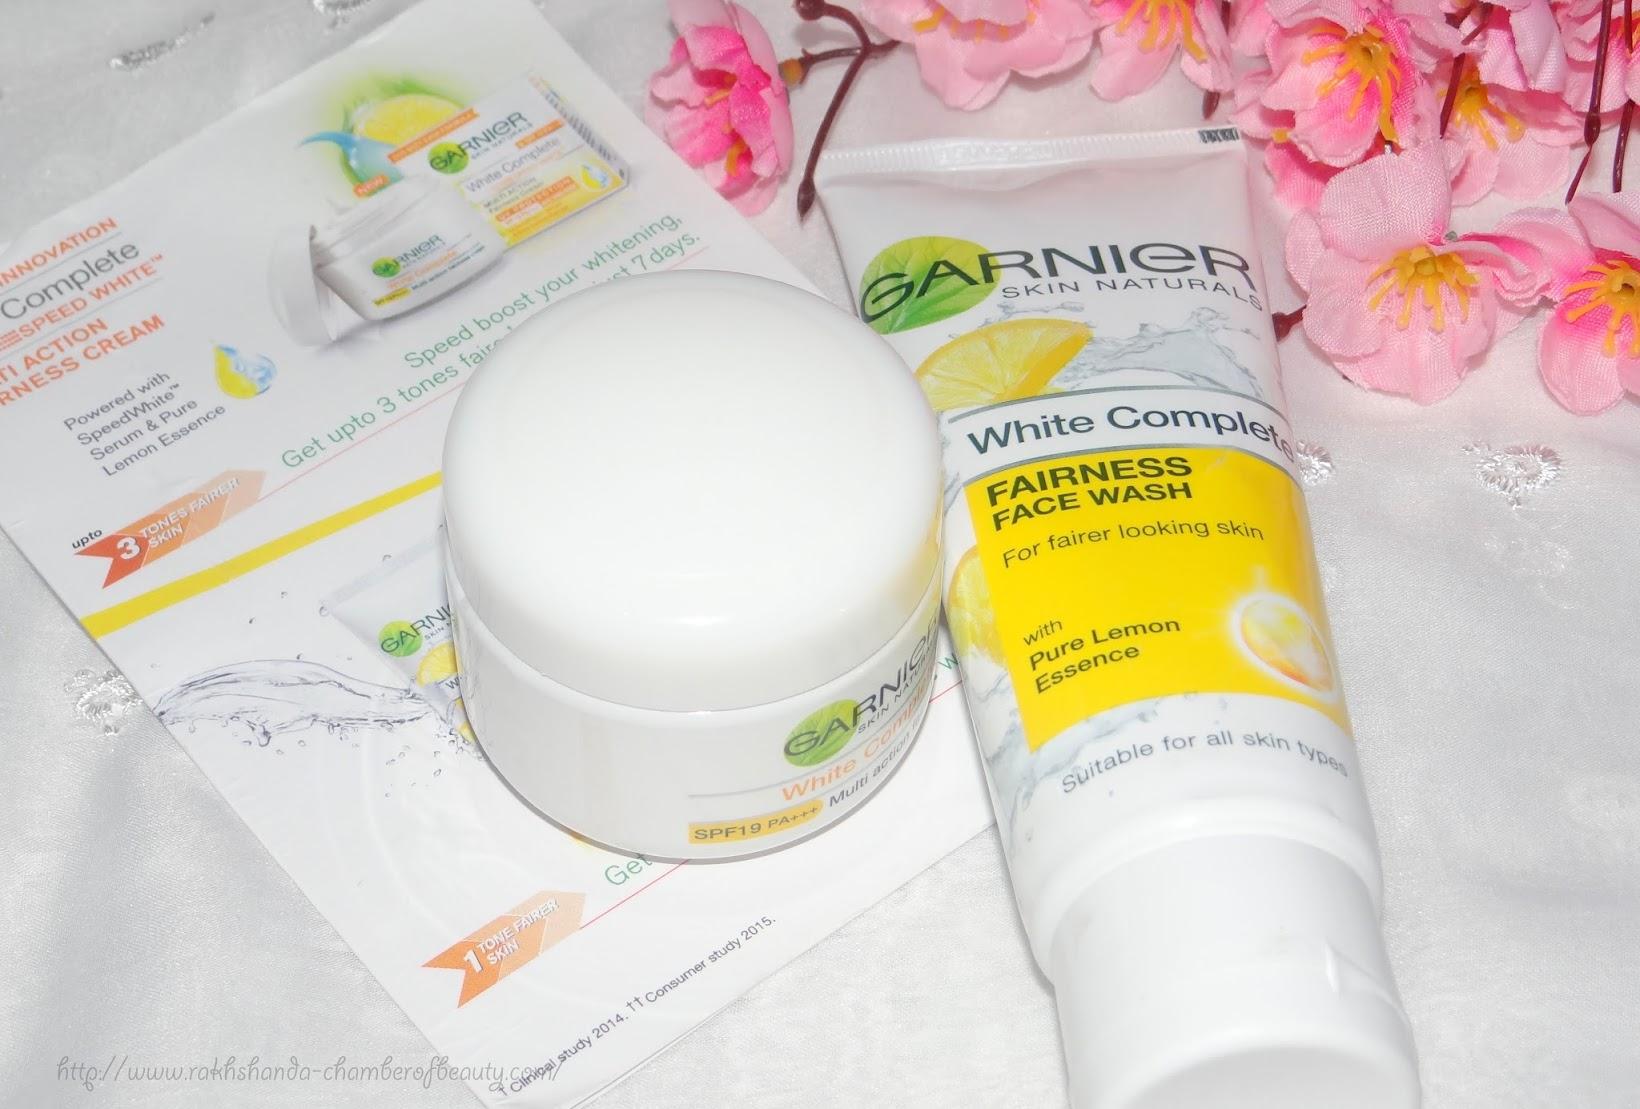 #7DayGarnierChallenge- Garnier White Complete Fairness Face Wash and Cream (review, photos, price), fairness cream, Indian beauty blogger, Chamber of Beauty